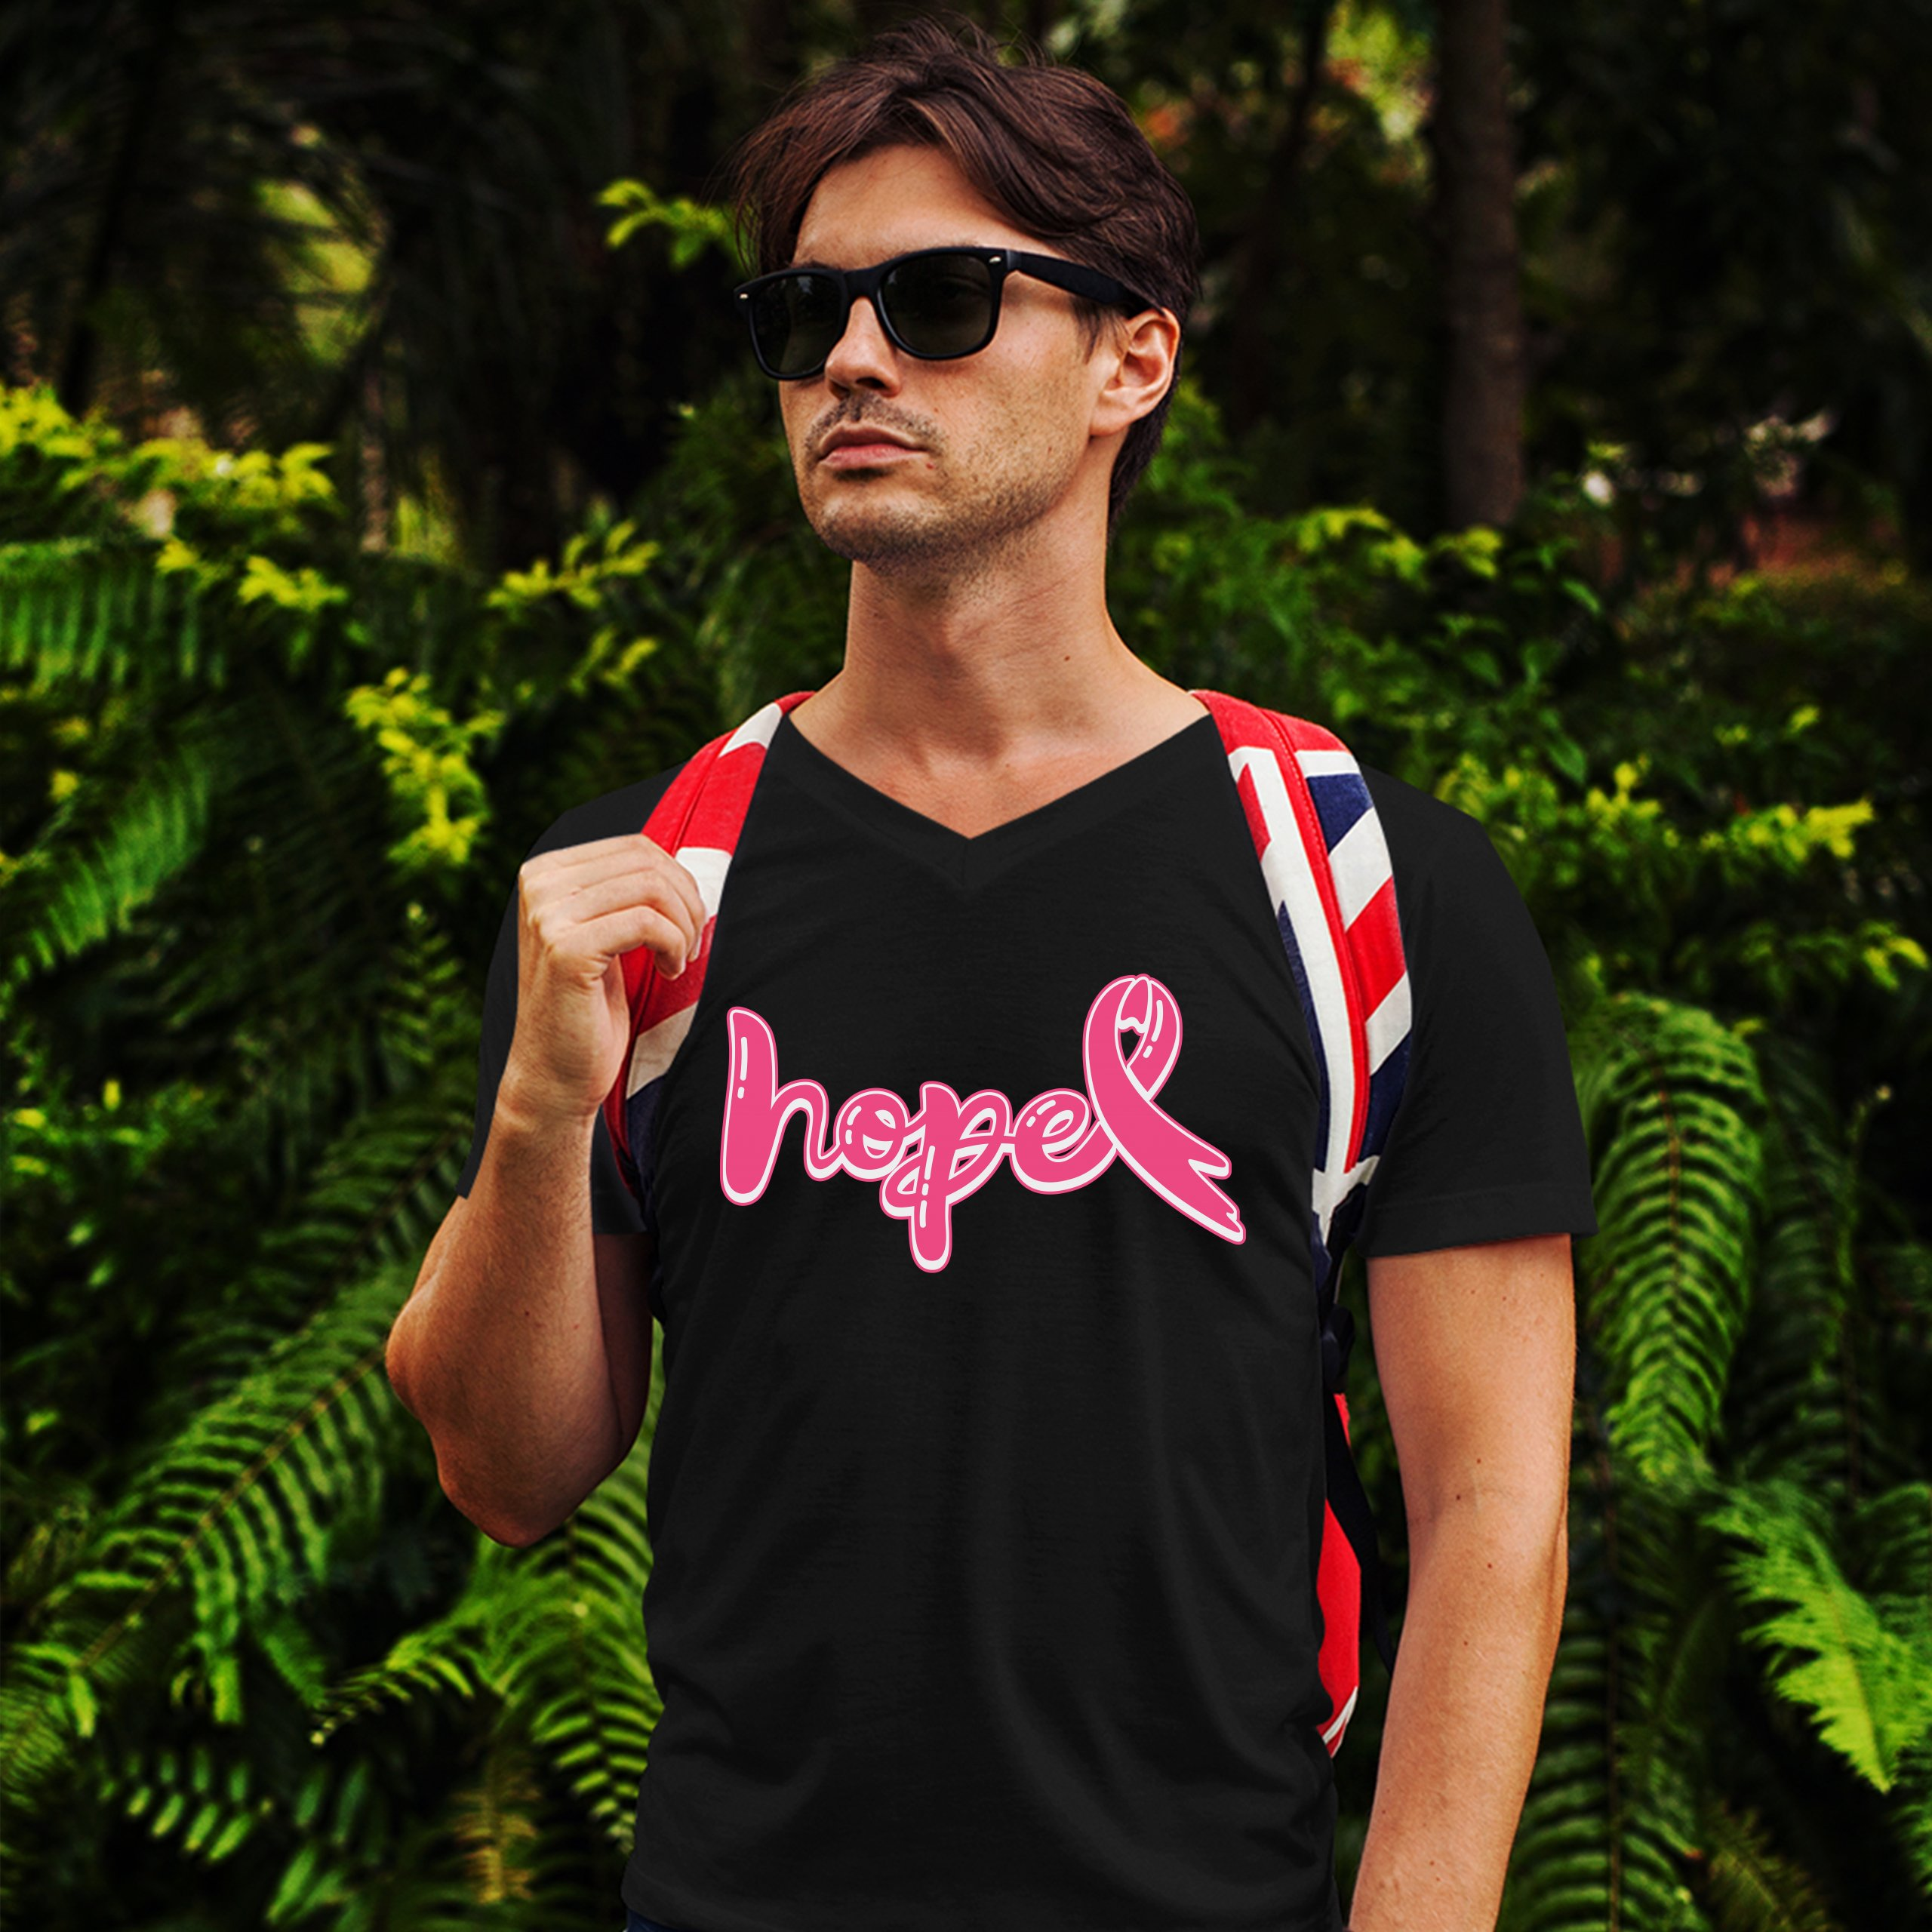 Hope Pink Ribbon V-Neck T-shirt Breast Cancer Awareness Month Tee